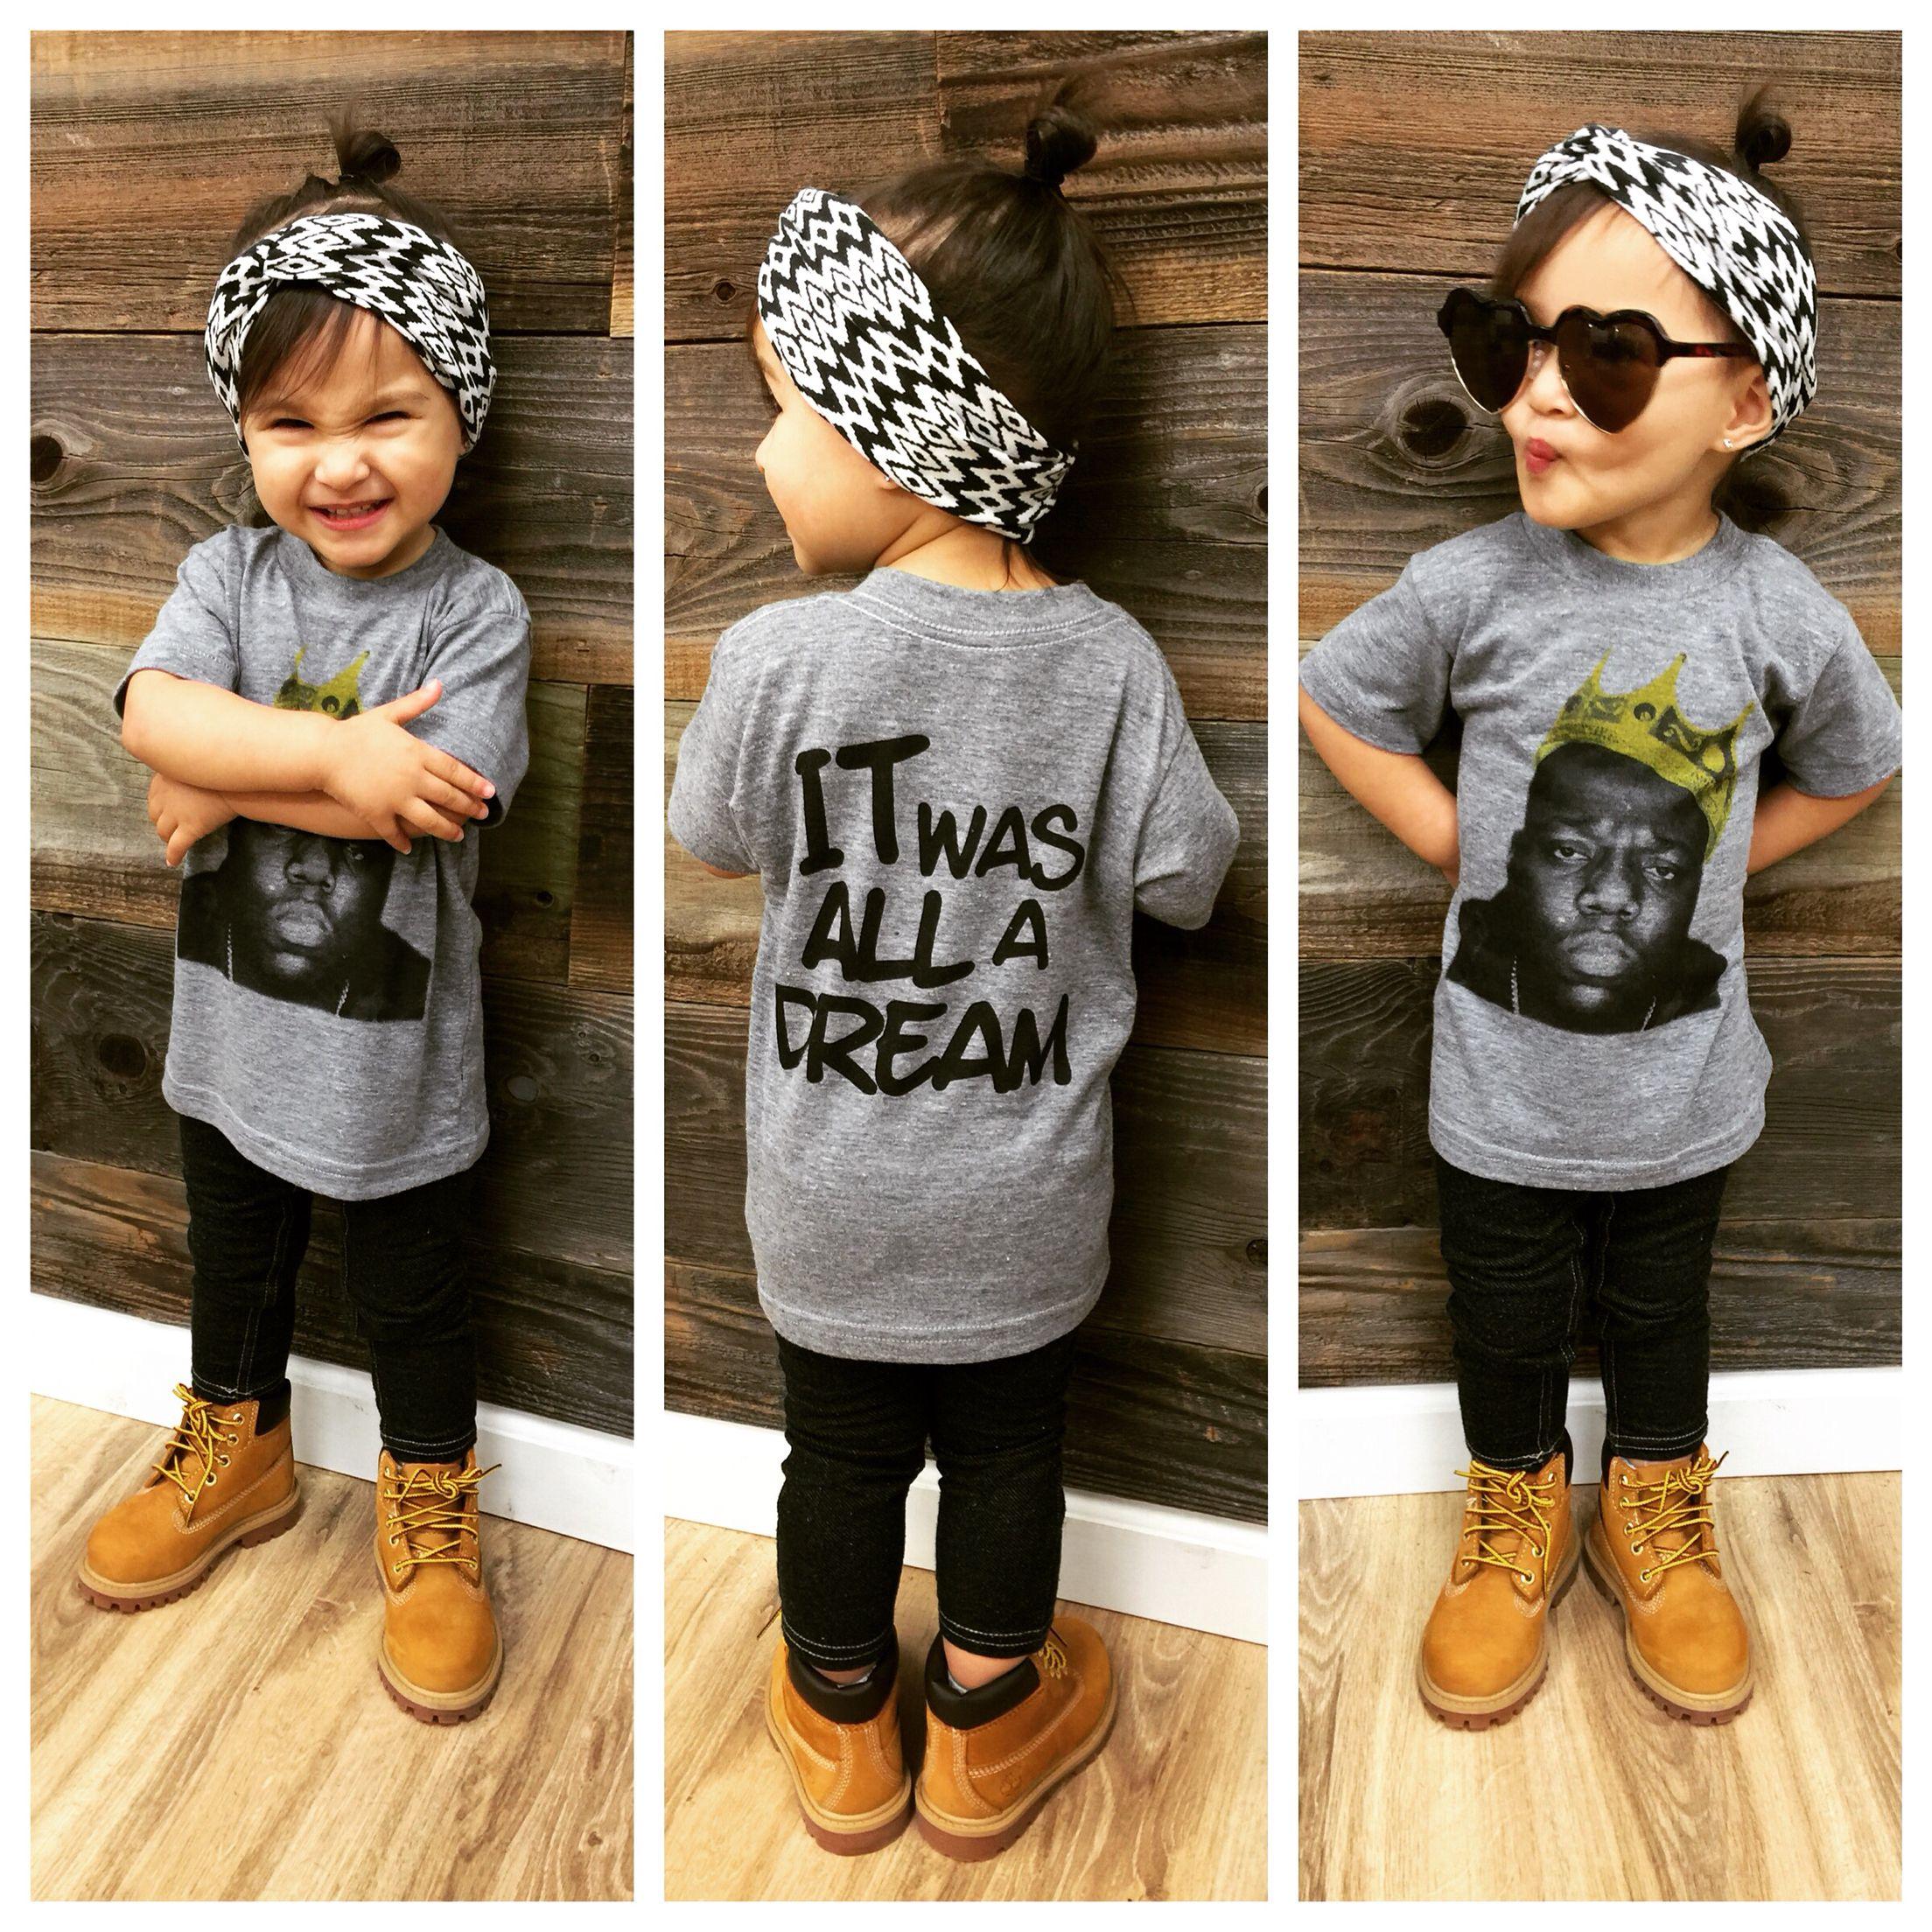 Toddler Fashion Notoriousbig Itwasalladream Timberlands Heartshades Headwrap. That Shirt Though ...